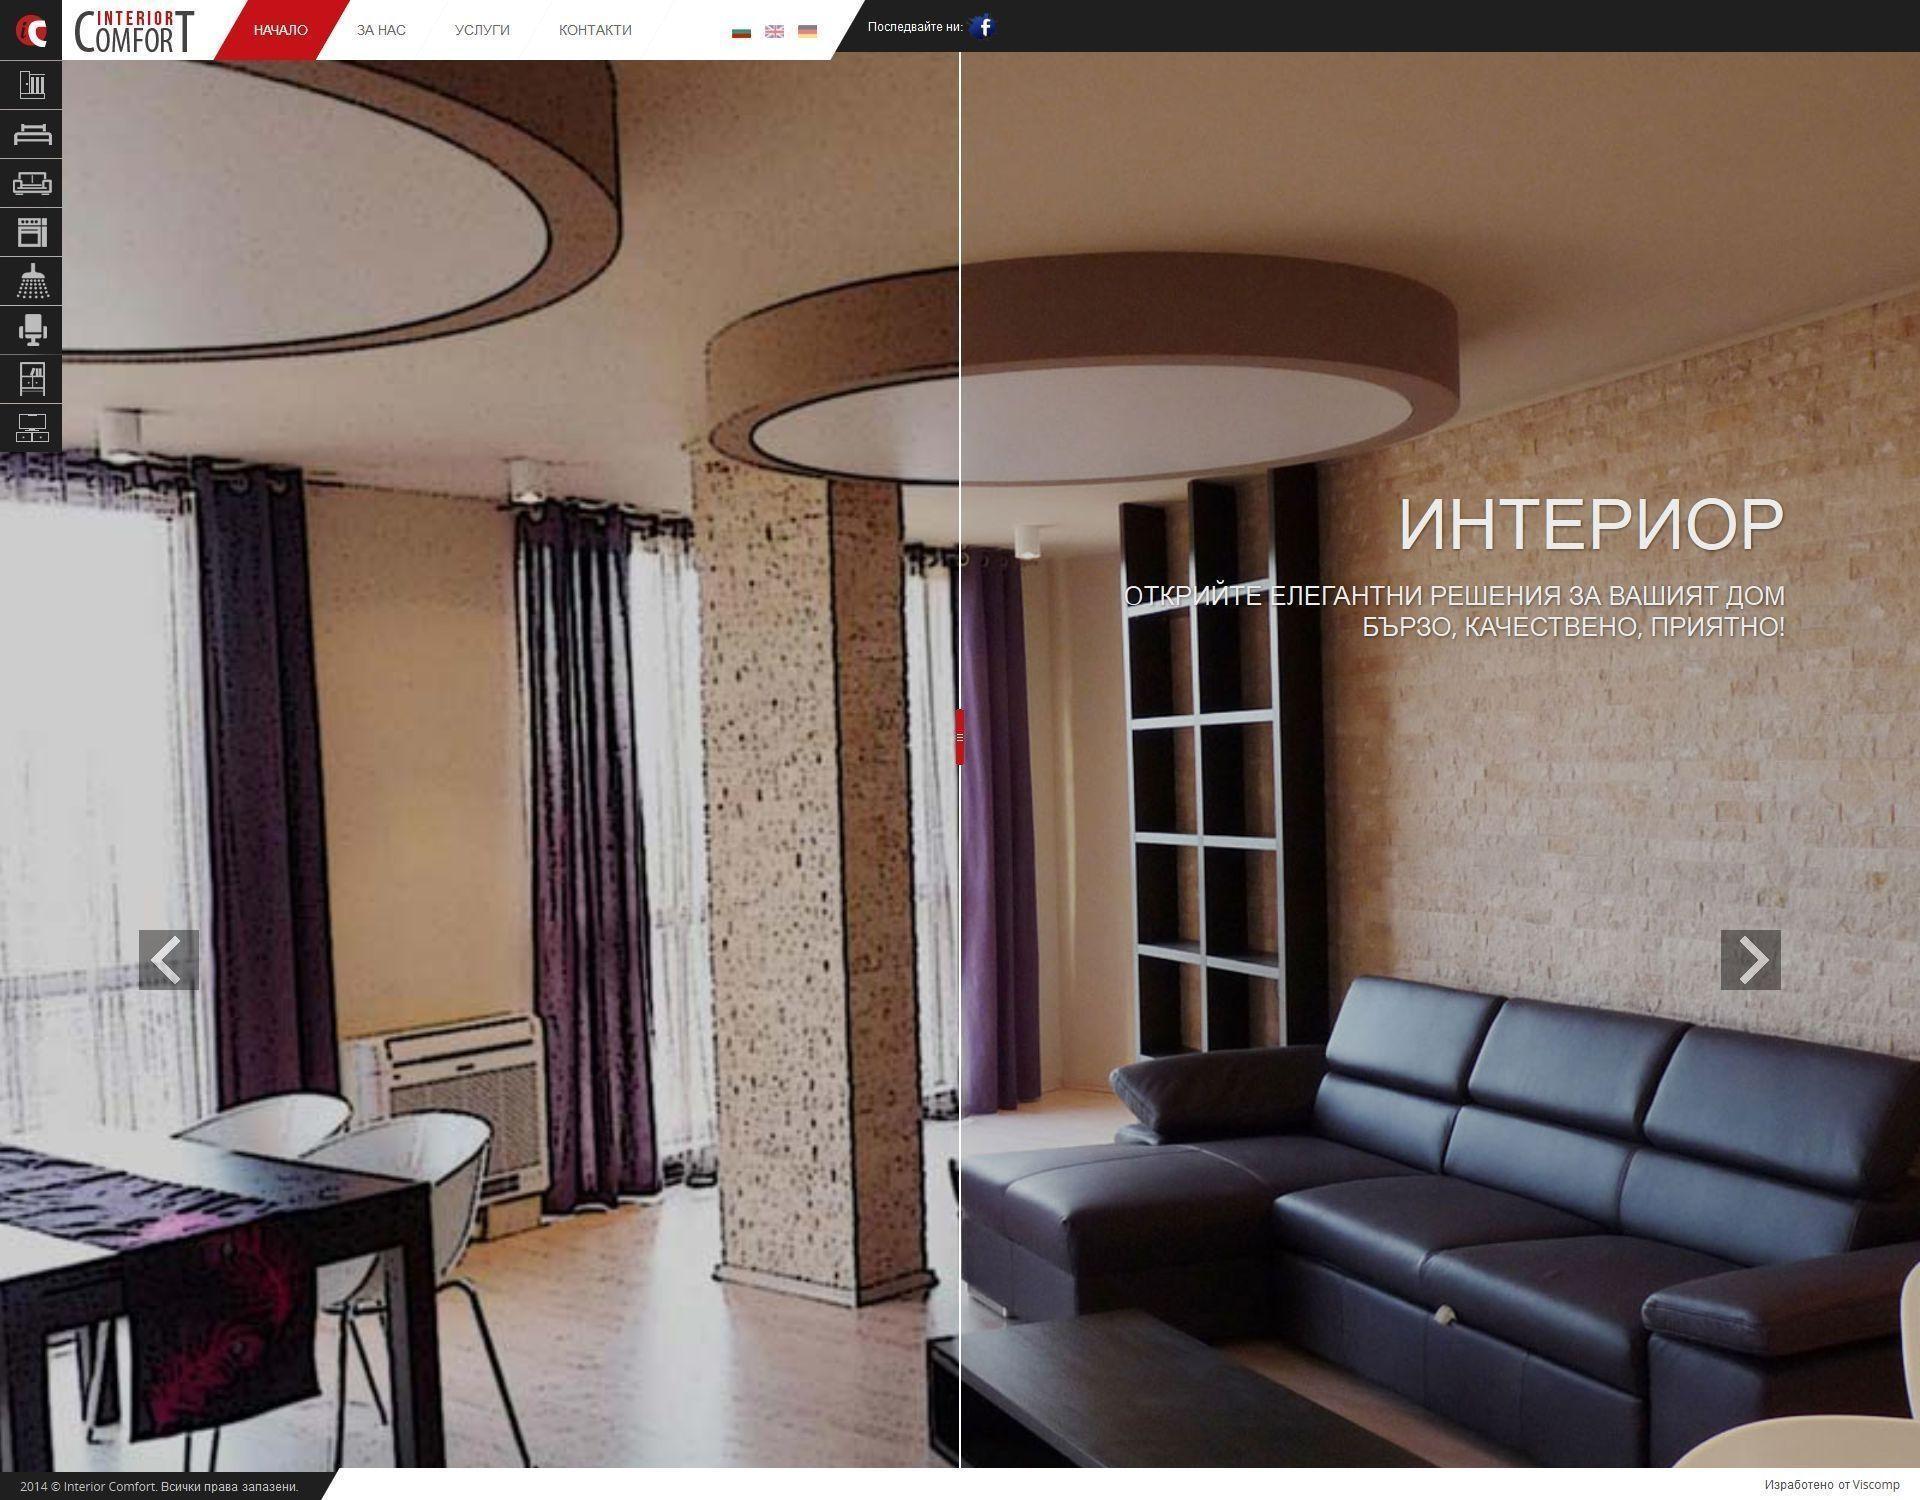 8271246-interior-comfort.com